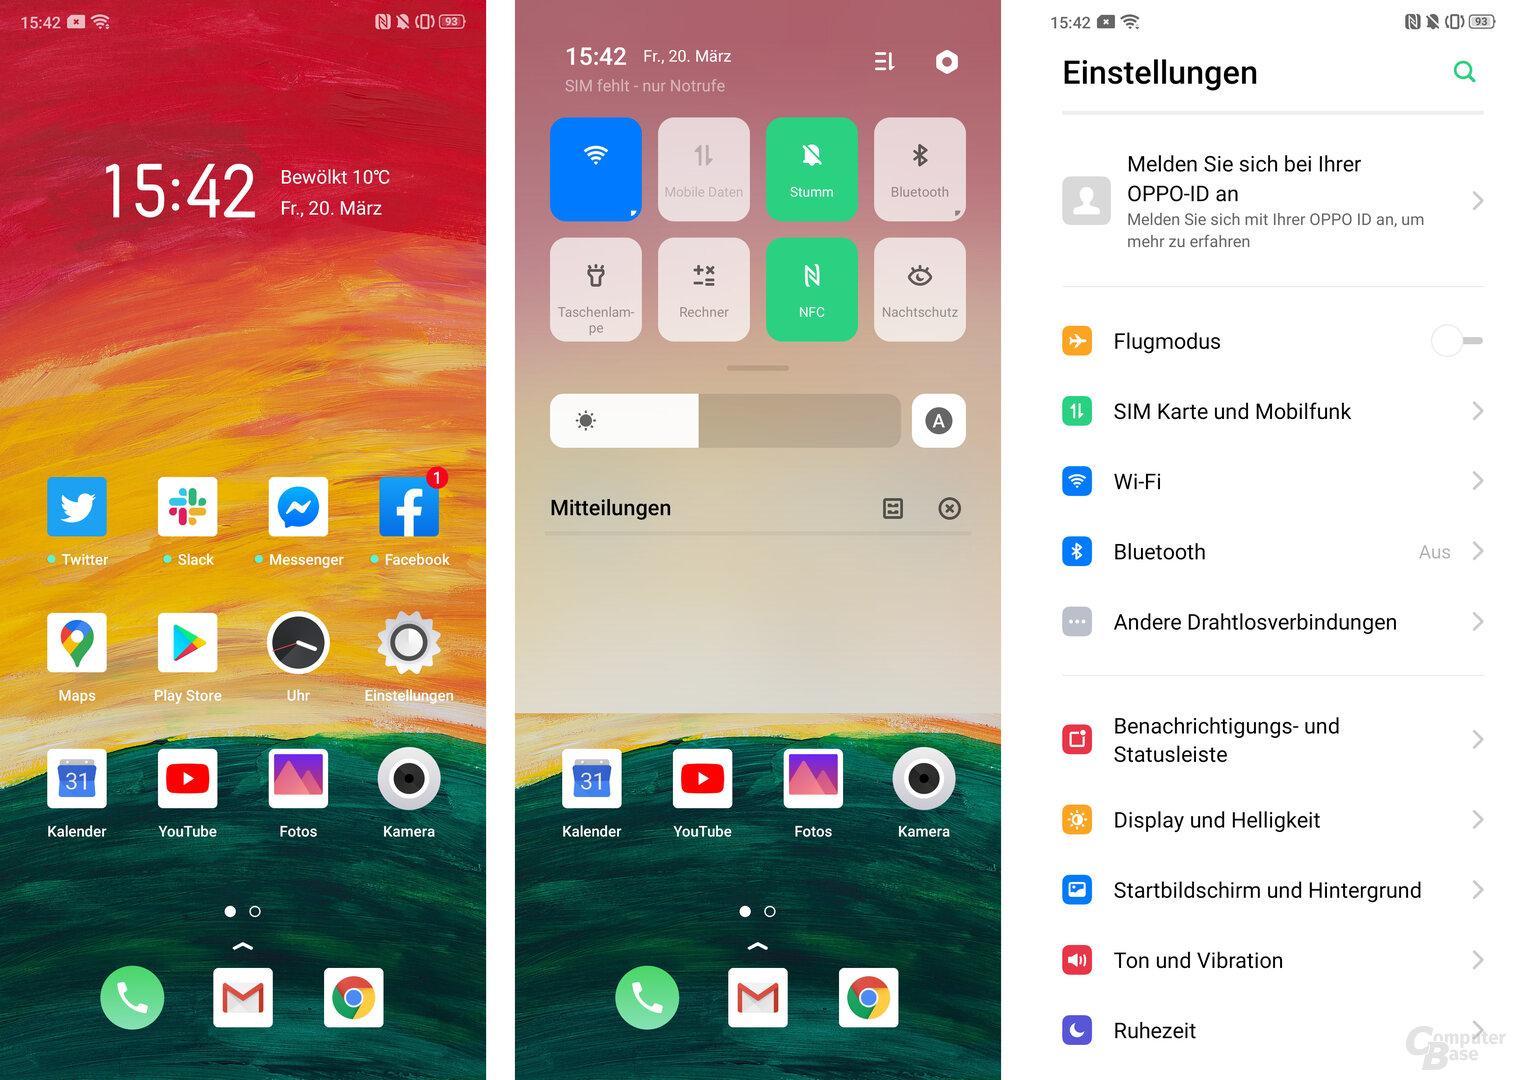 ColorOS 6.1 auf Basis von Android 9.0 Pie